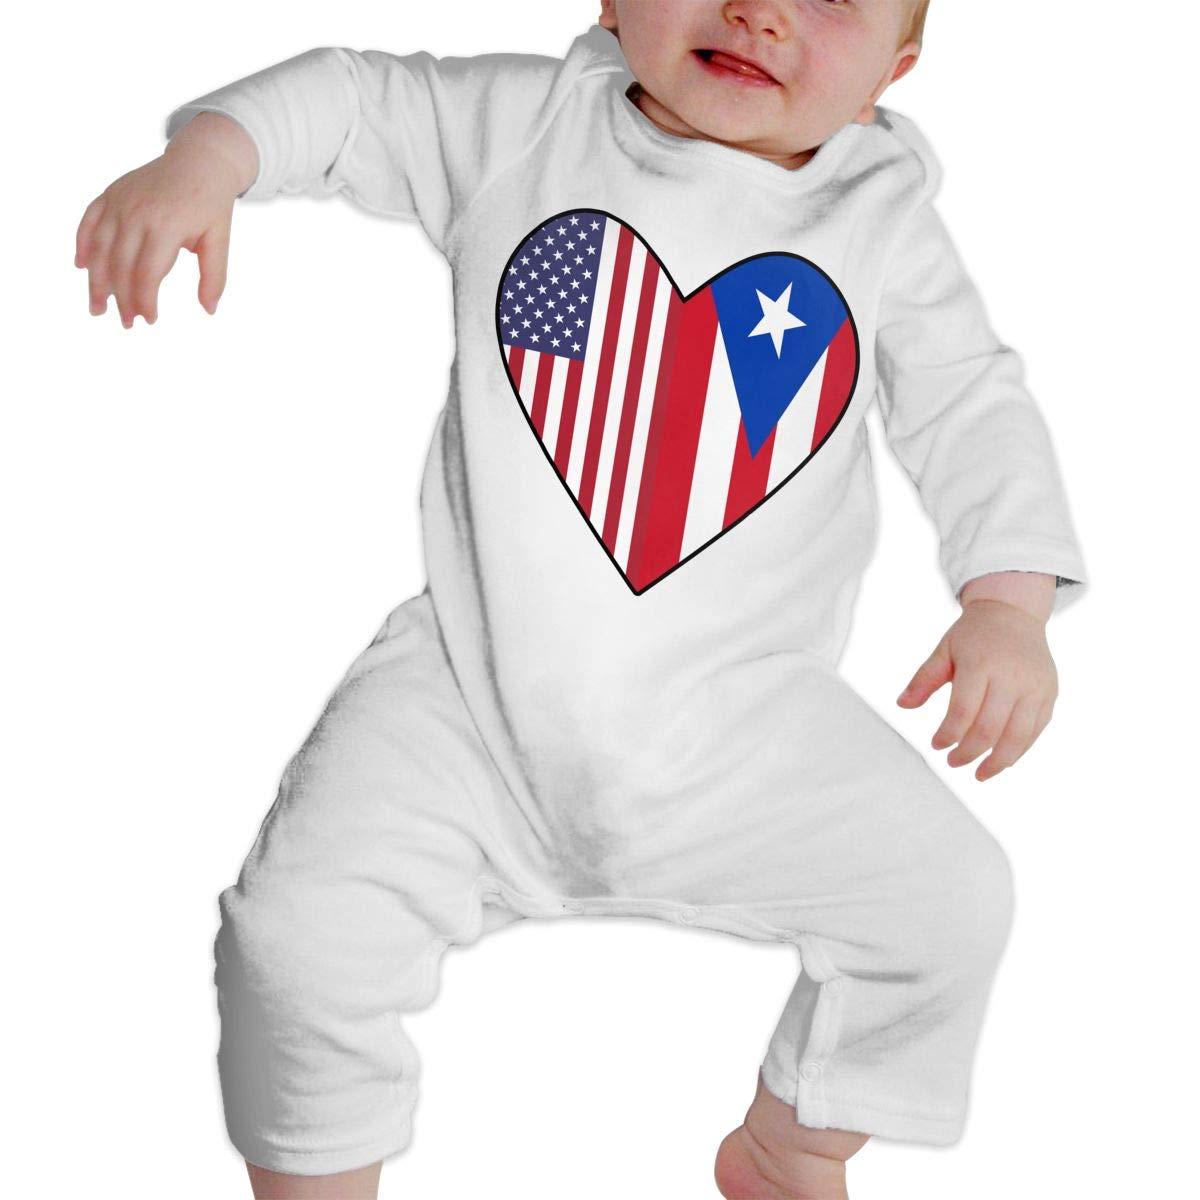 Infant Babys Cotton Long Sleeve Half Puerto Rico Flag Half USA Flag Love Heart Climb Jumpsuit One-Piece Romper Clothes